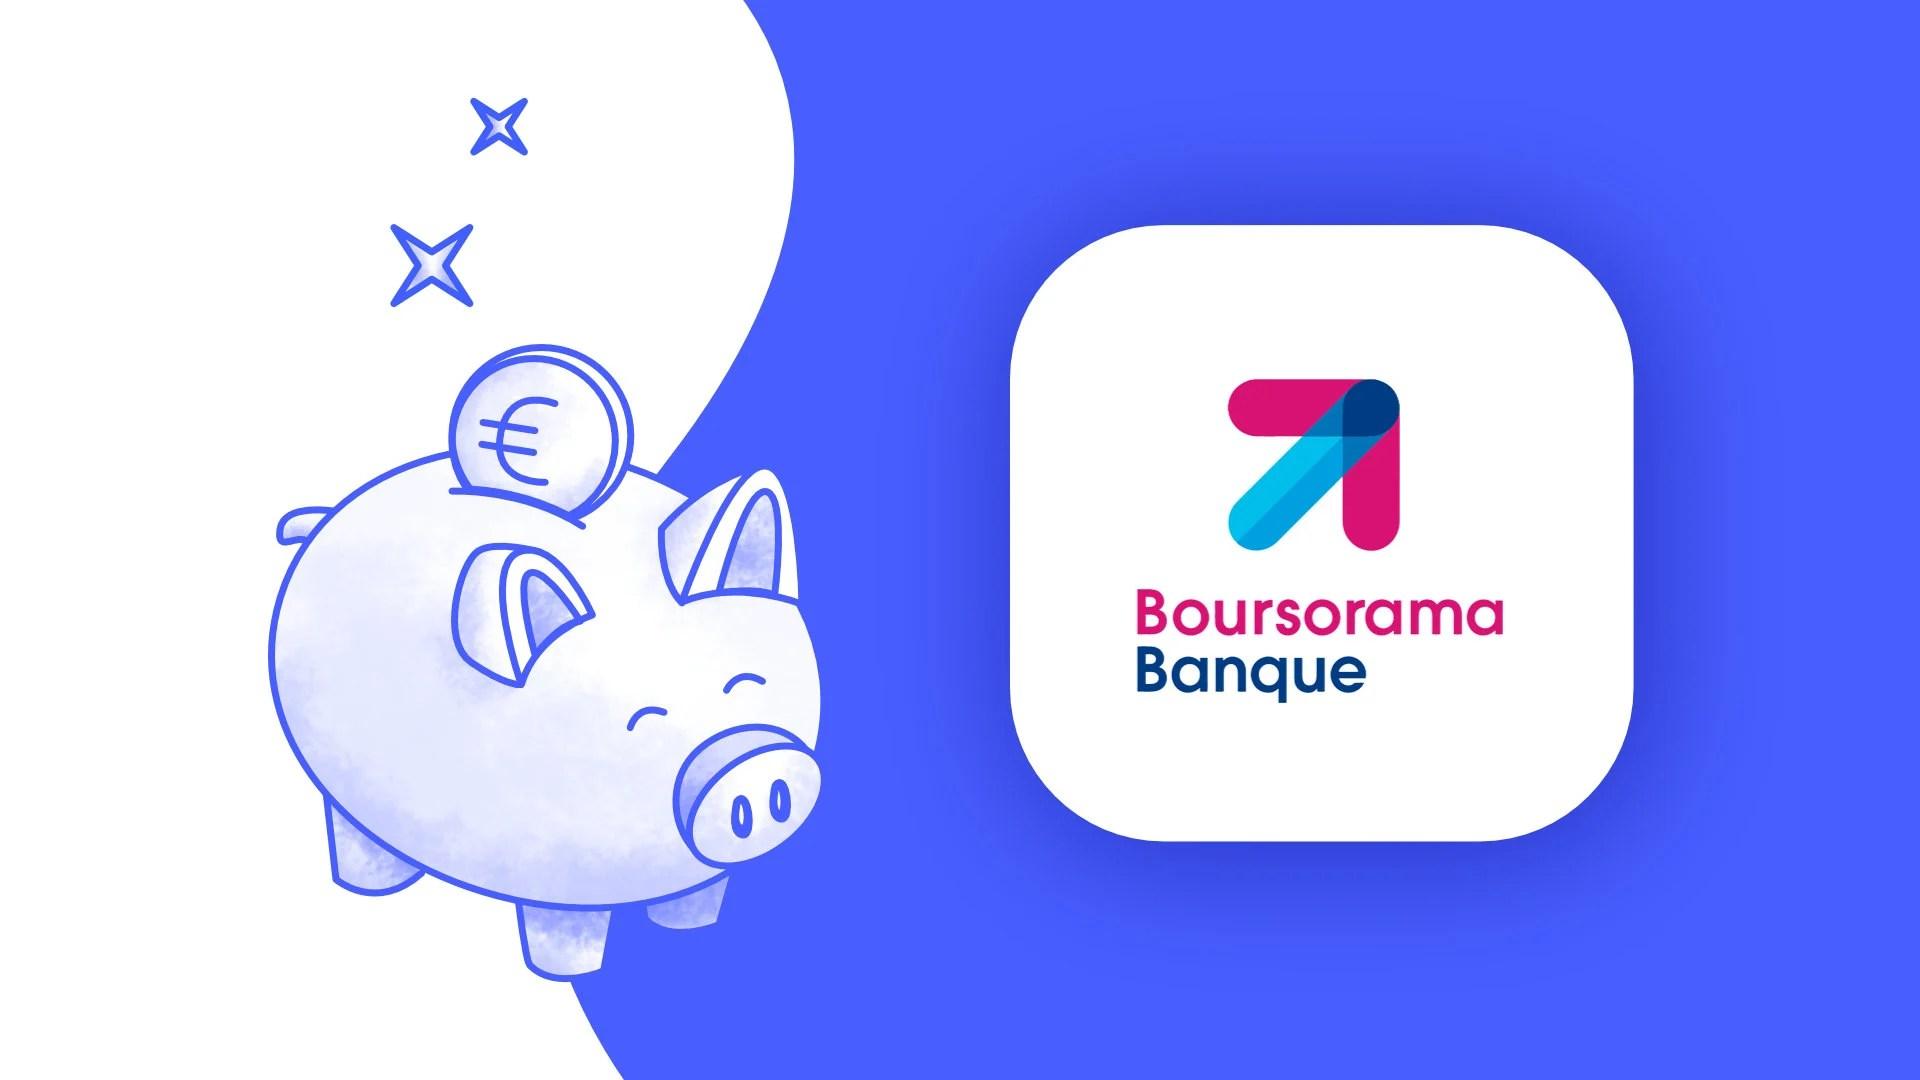 Notre avis sur Boursorama Banque